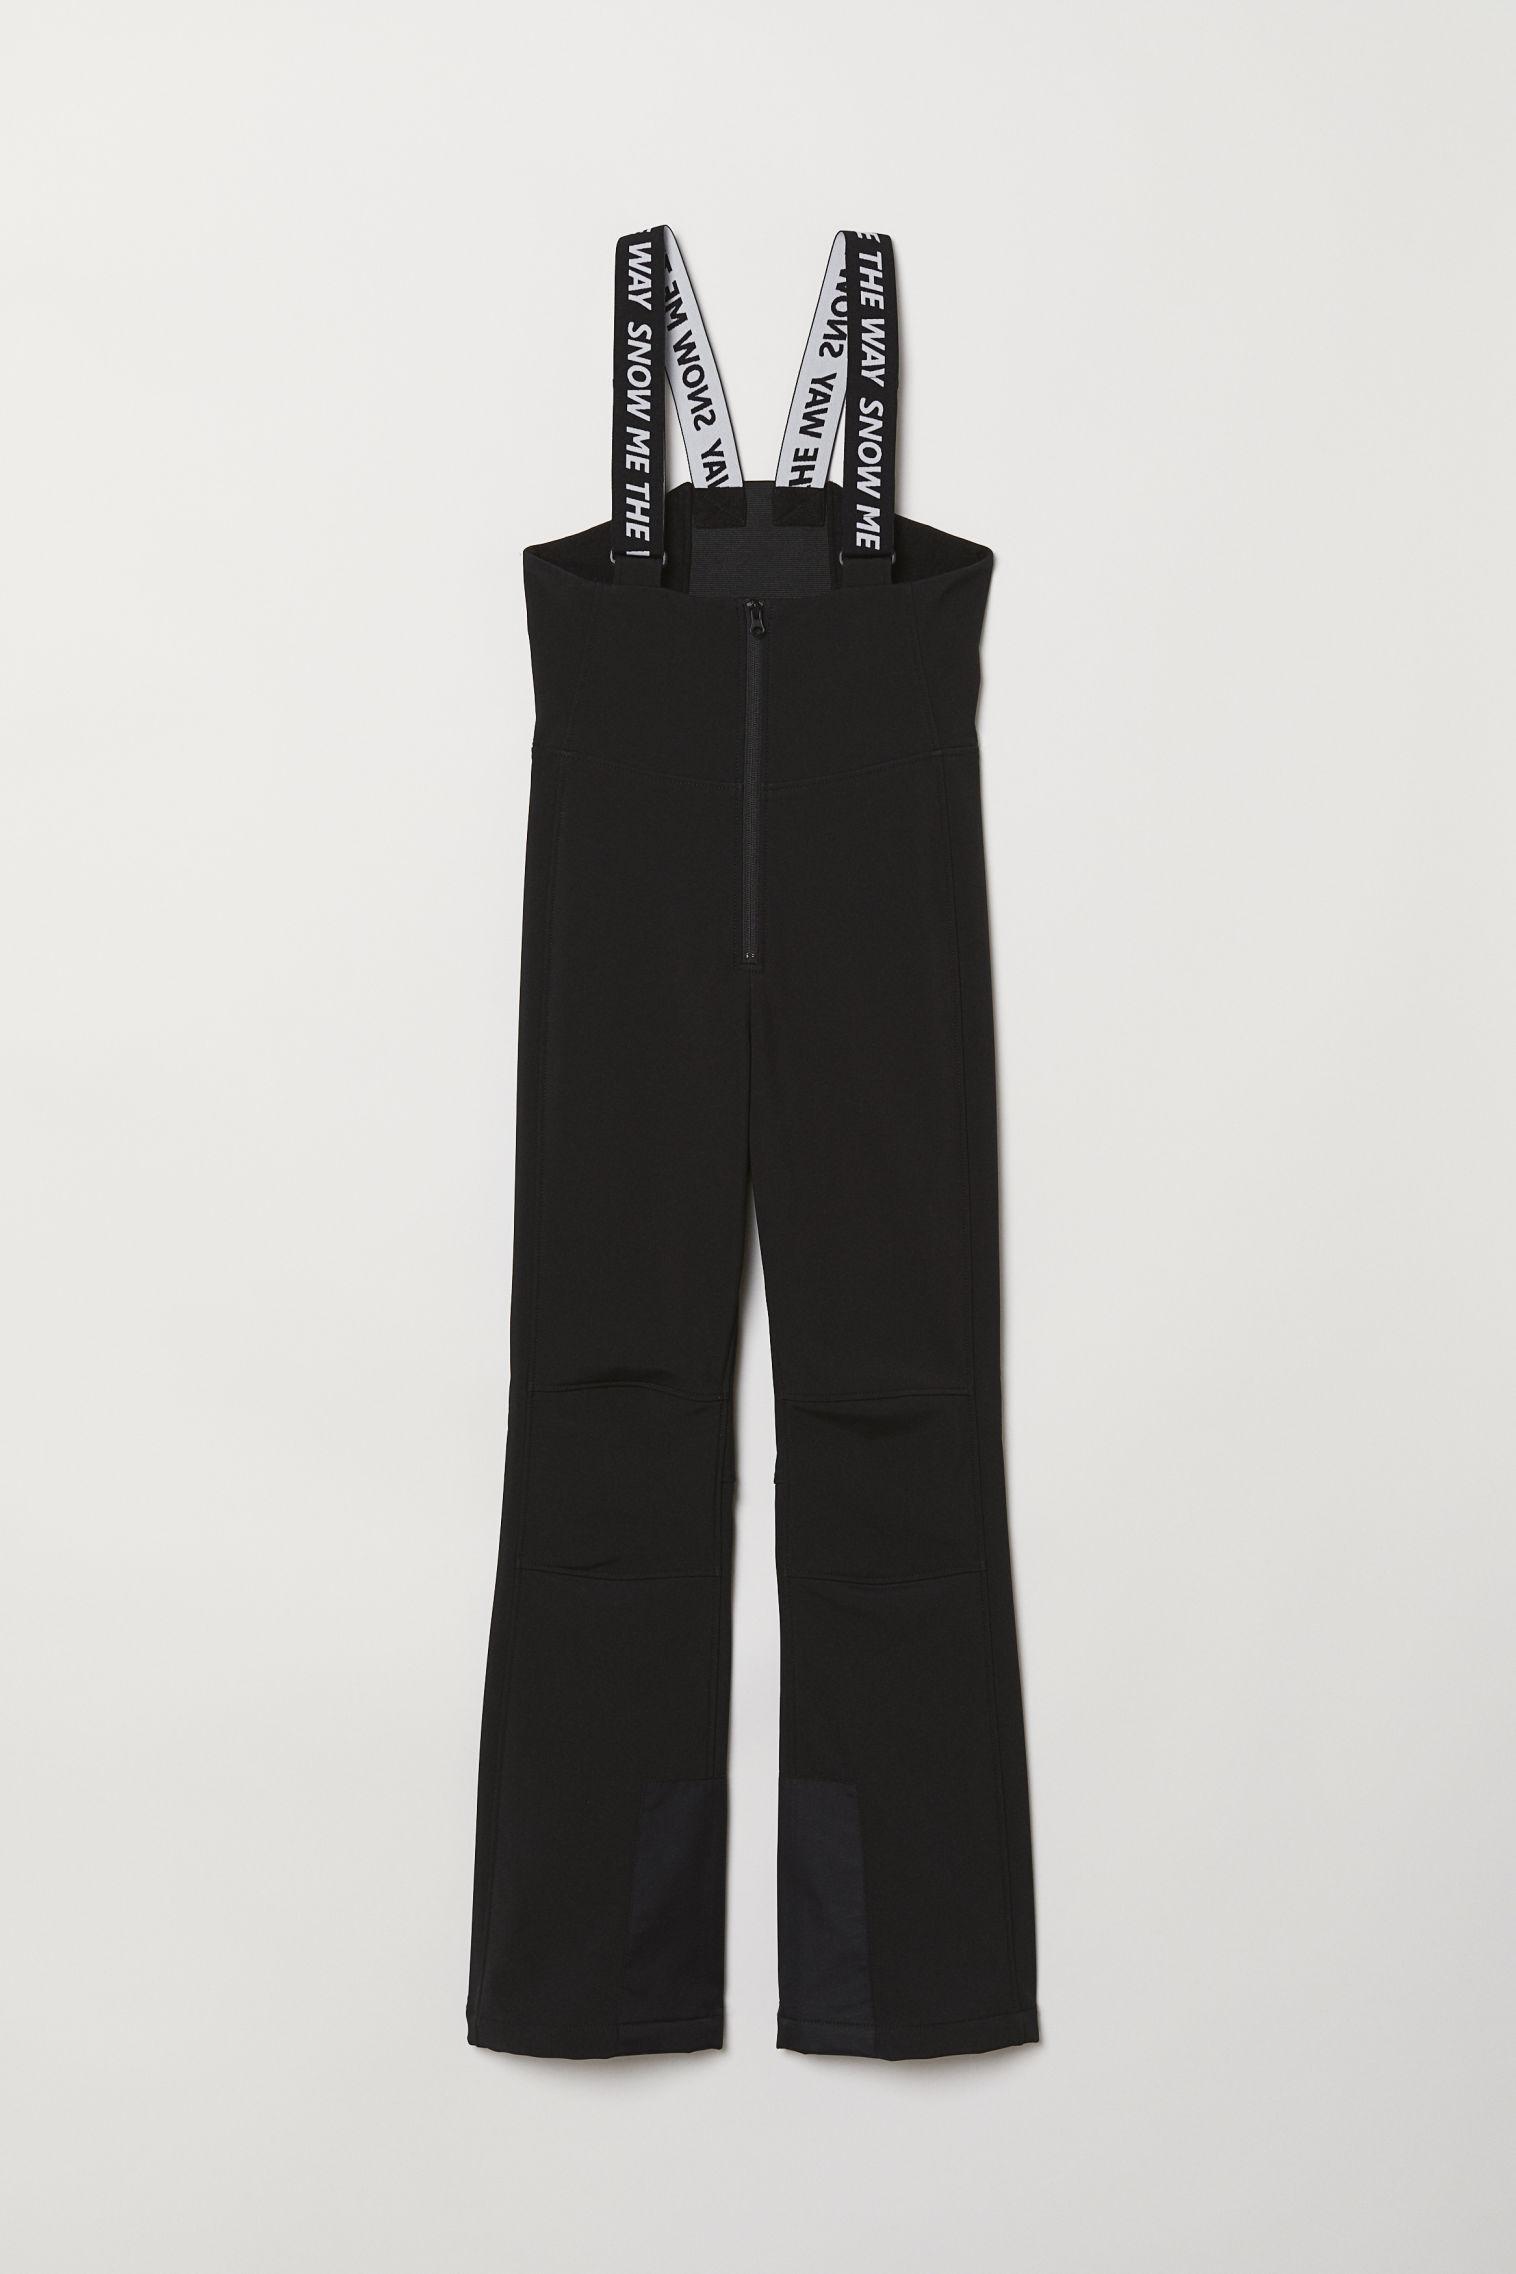 67483d9e5895 Ski Pants with Suspenders - Black - Ladies